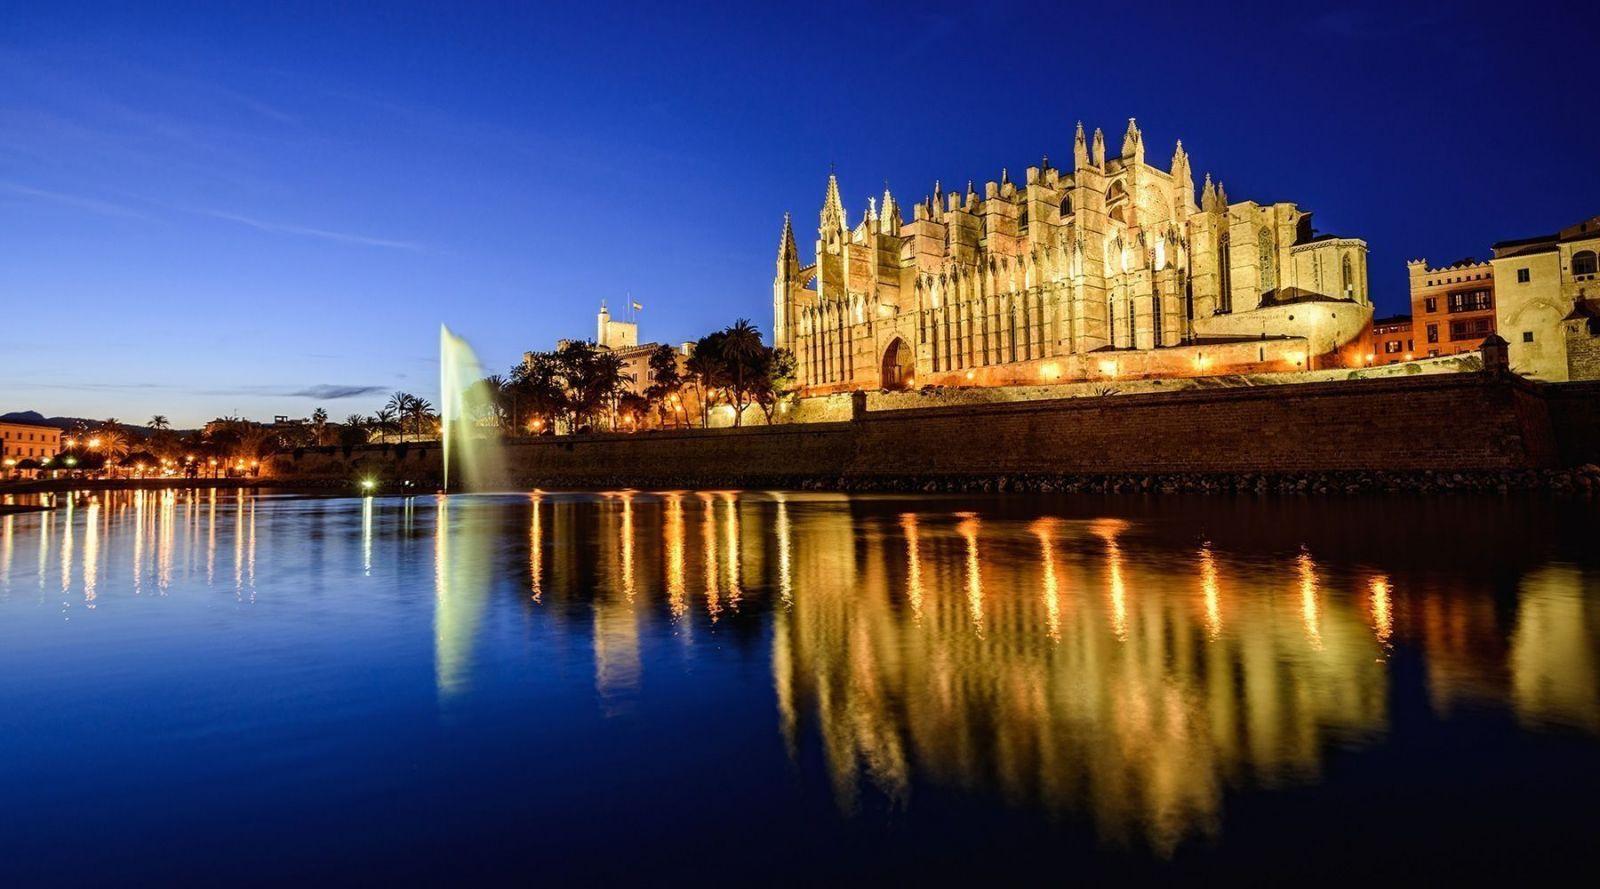 Mallorca cuenta con mercado para abrir rutas con China y países de América